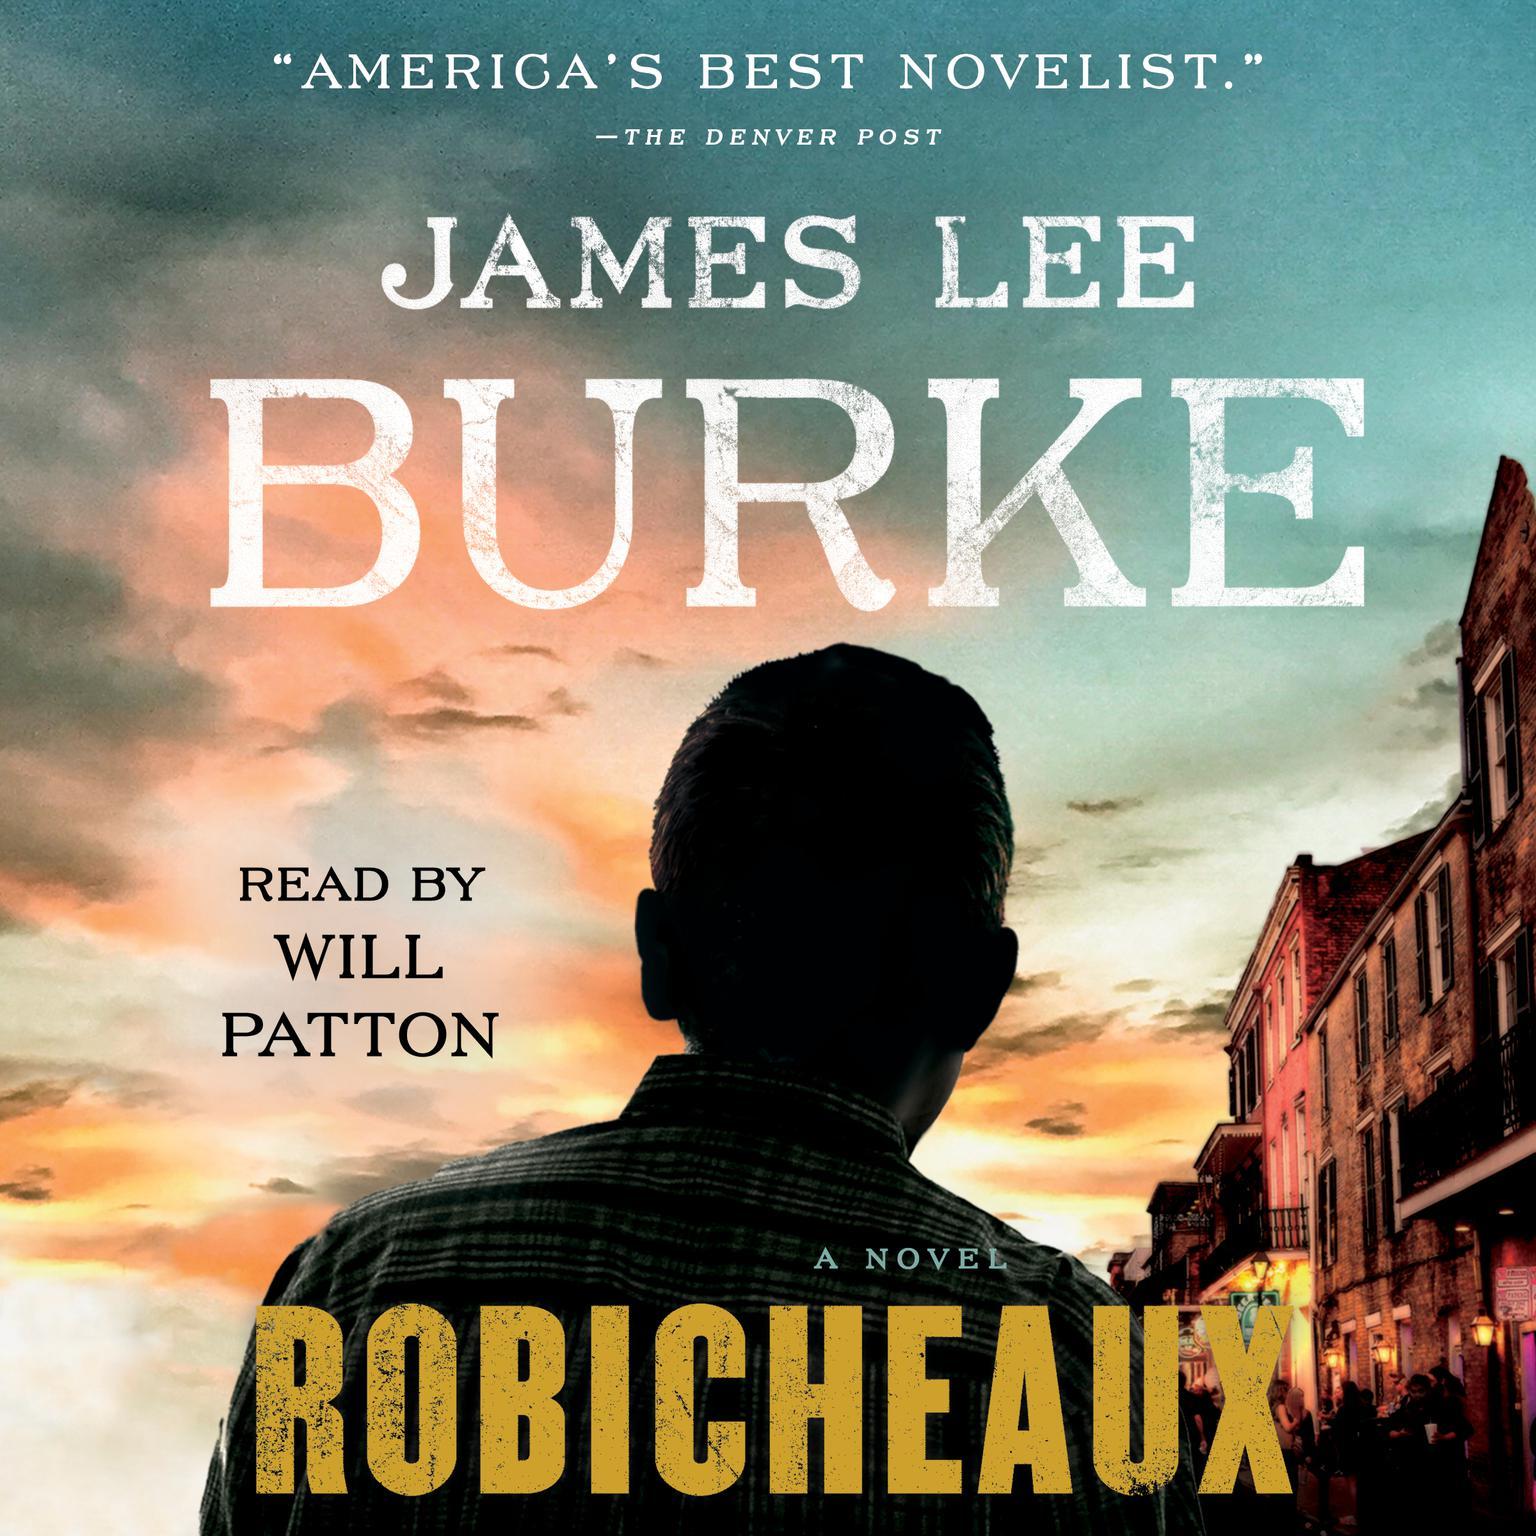 Robicheaux: A Novel Audiobook, by James Lee Burke